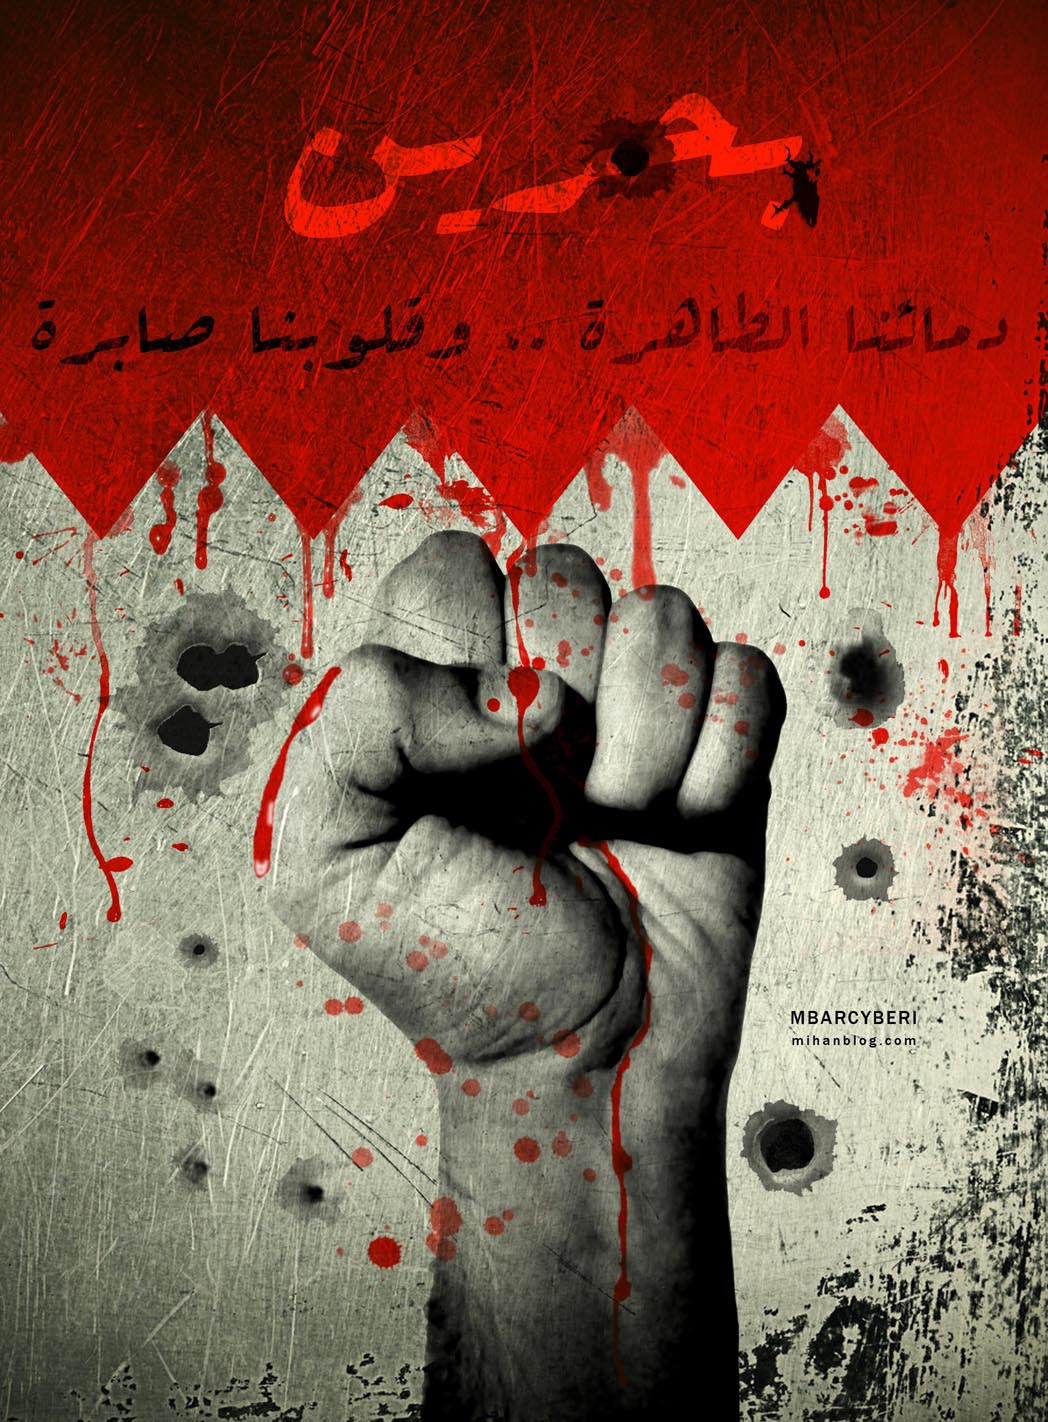 http://fc02.deviantart.net/fs71/f/2011/104/3/6/4_bahrain_by_hmsk11-d3dymdp.jpg